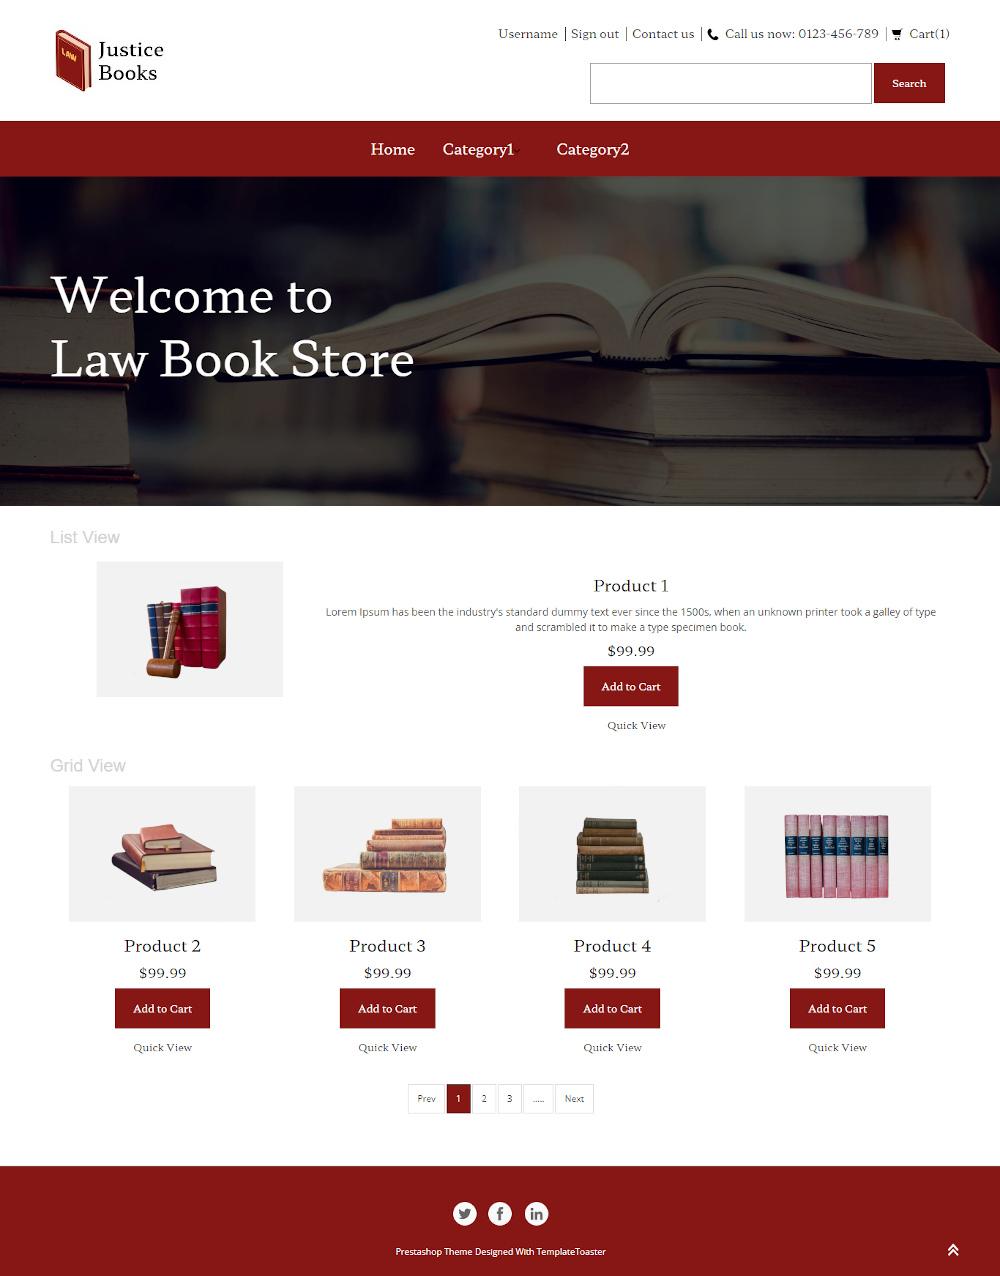 Justice Books - Online Law Education Books Store PrestaShop Theme